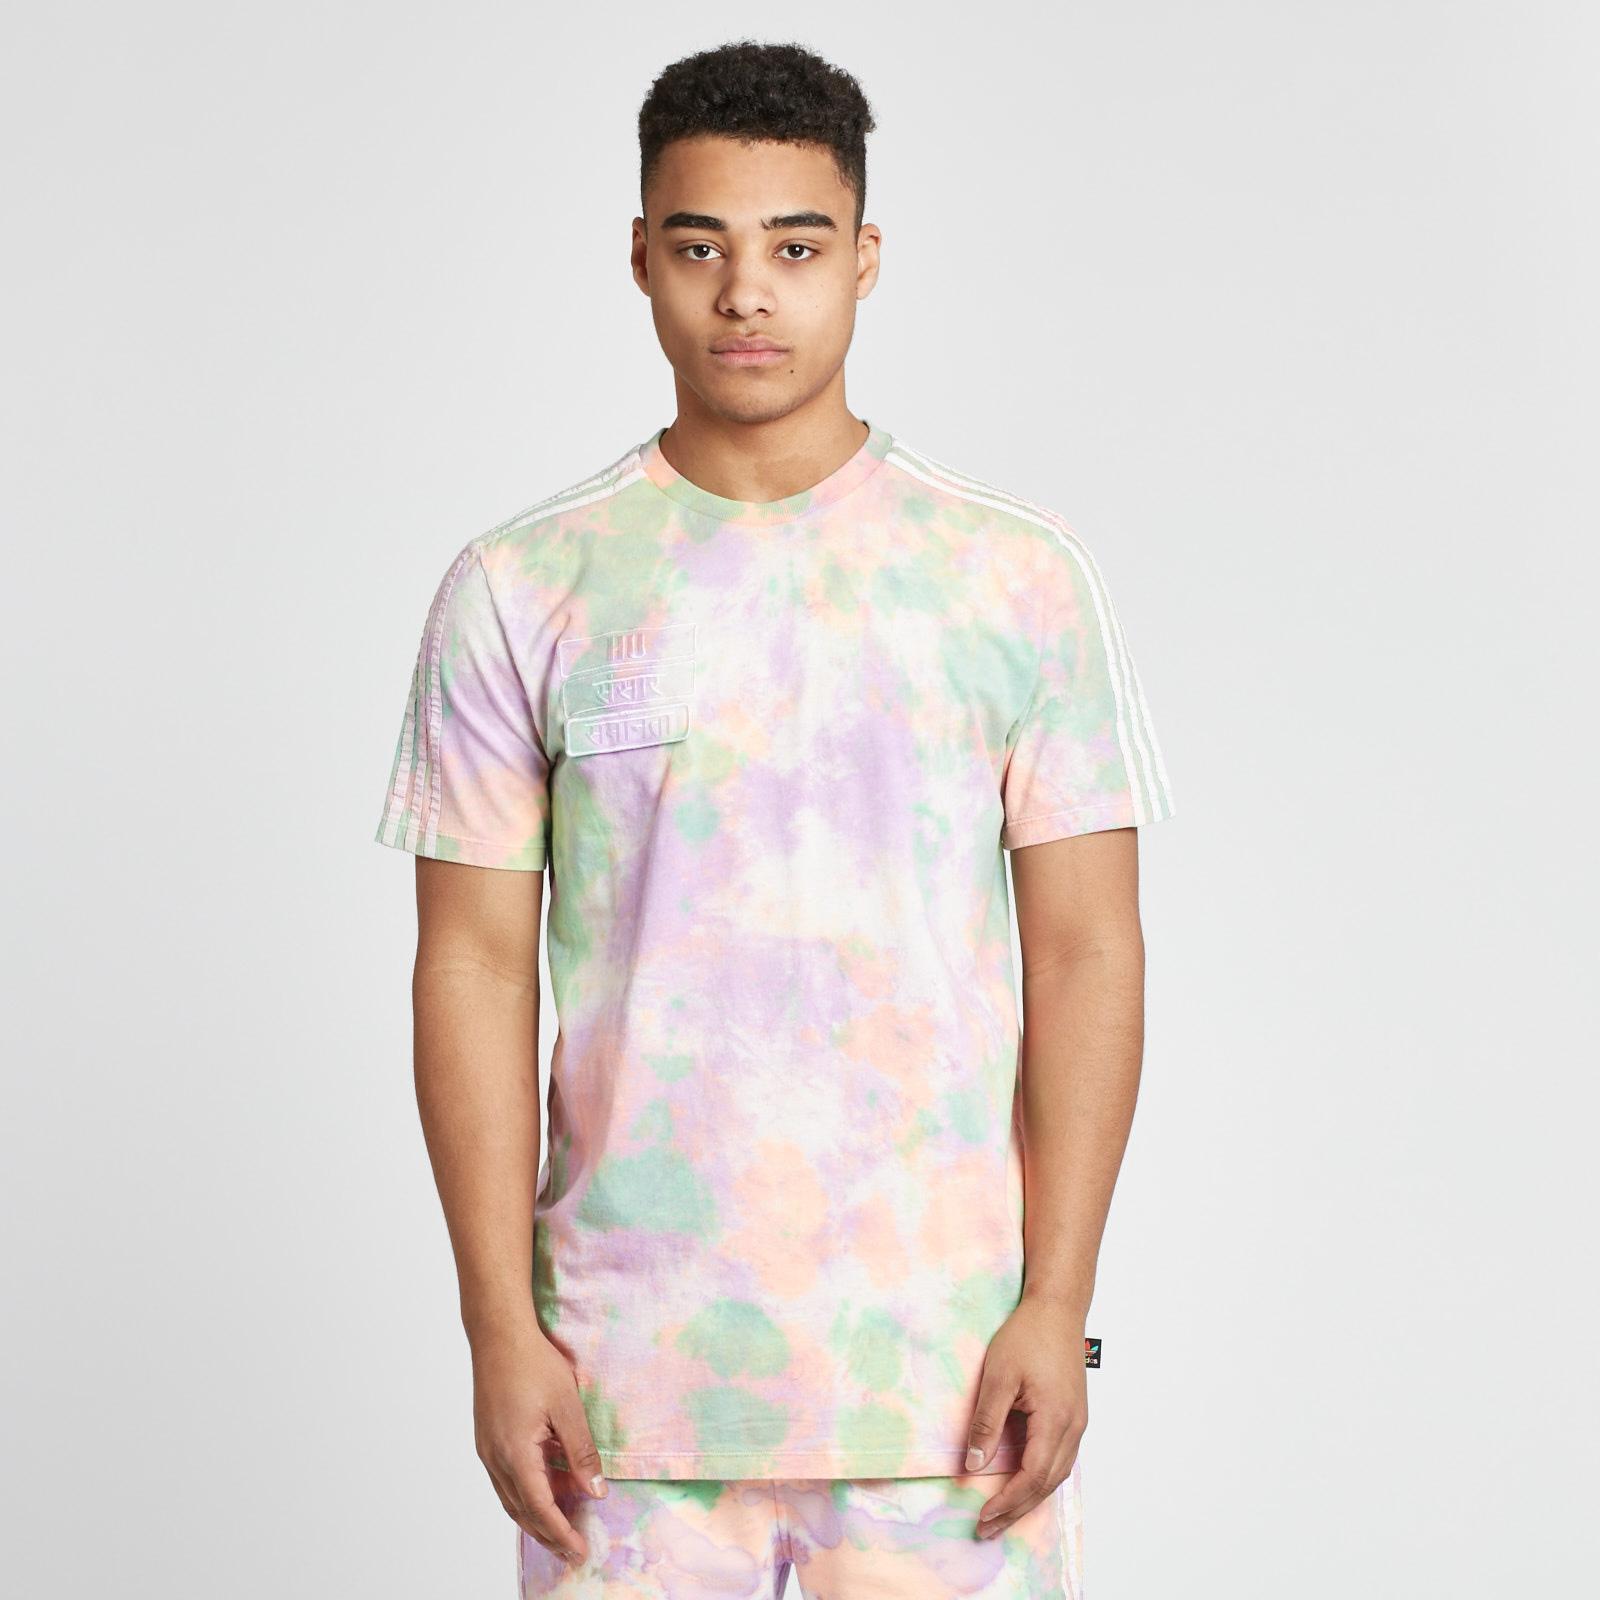 76652d7d0 adidas Hu Holi T-Shirt - Cw9414 - Sneakersnstuff